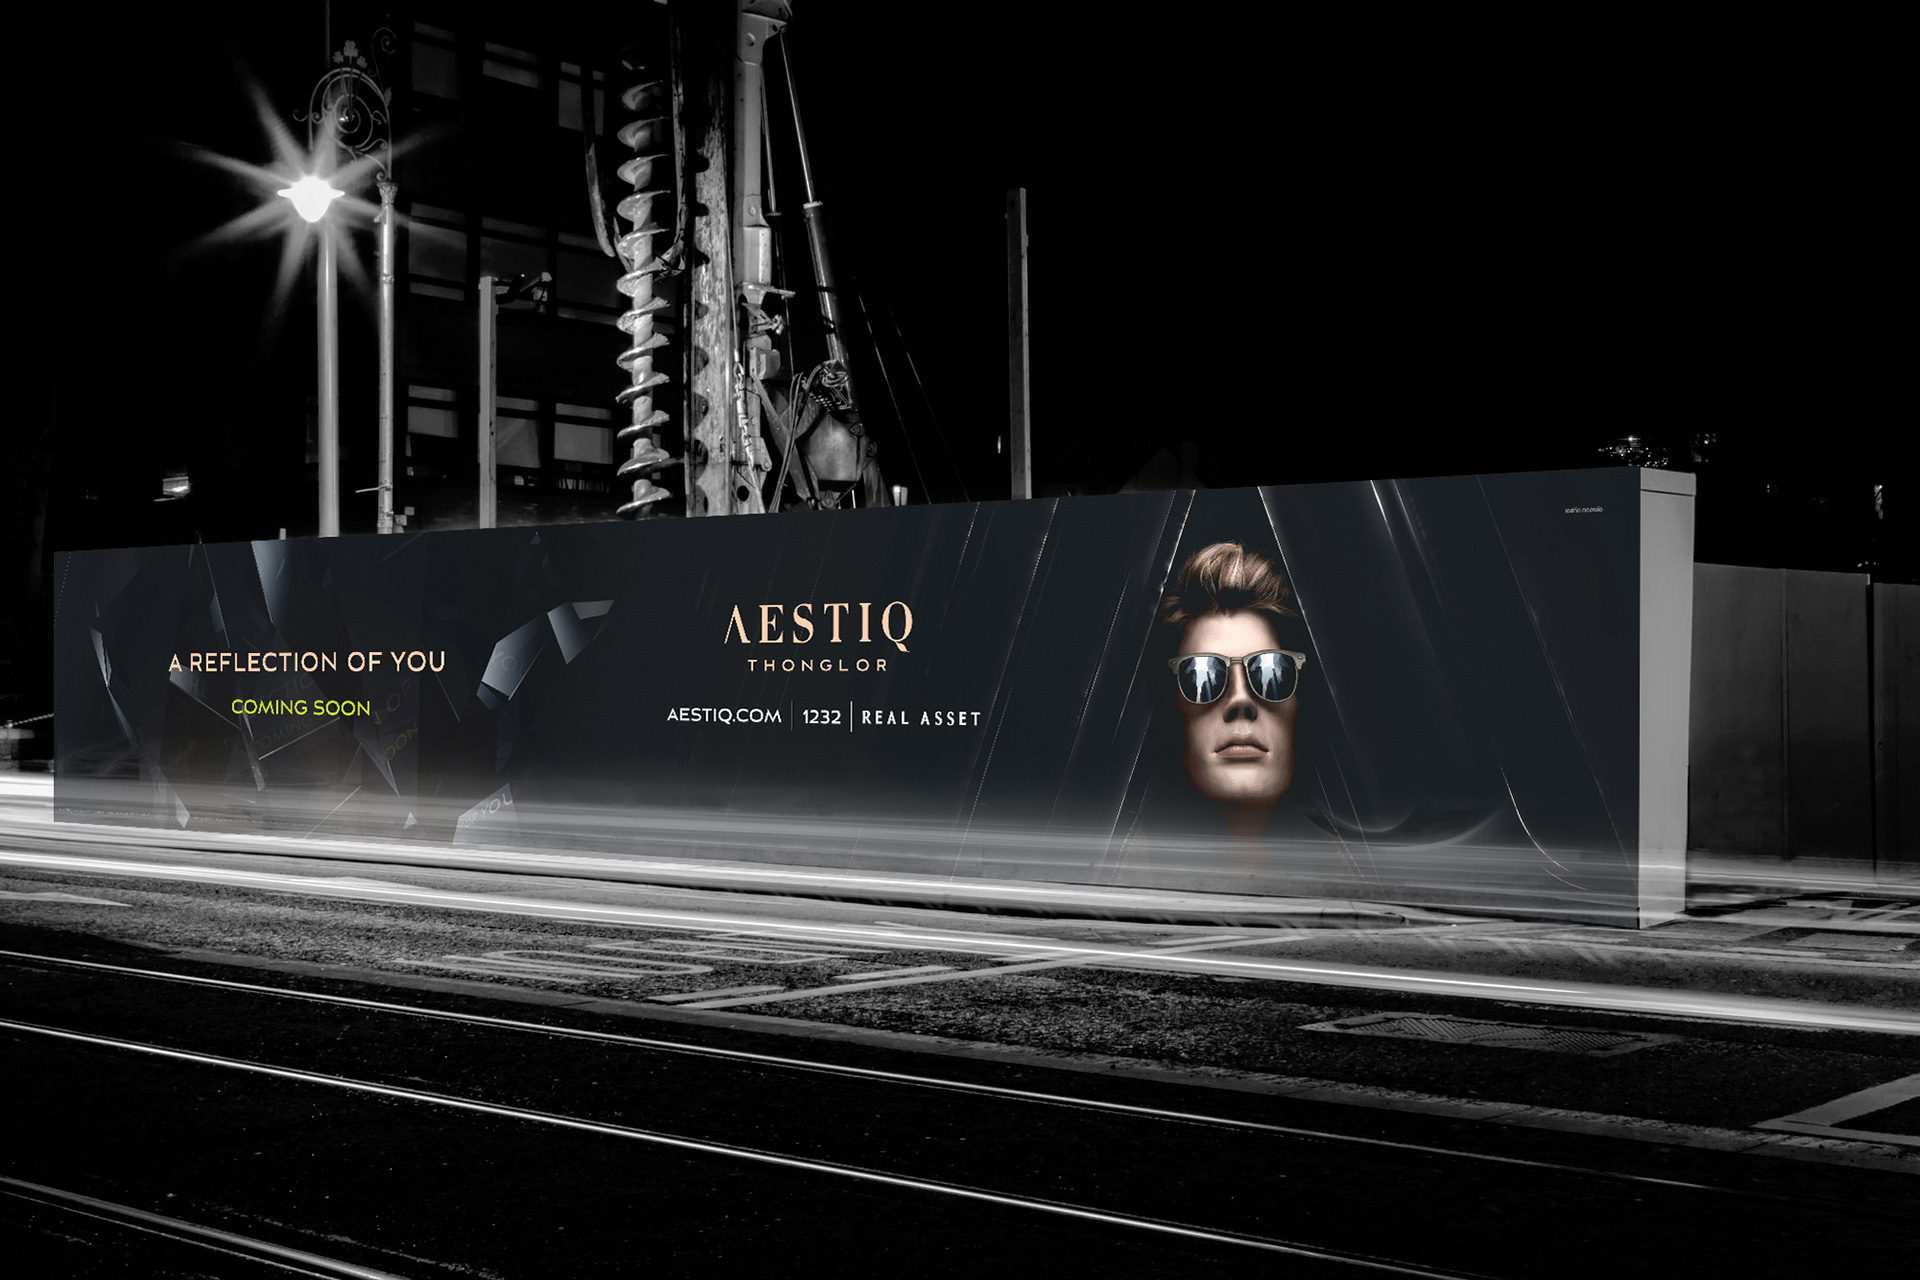 Aestiq - conspiracy creative digital agency